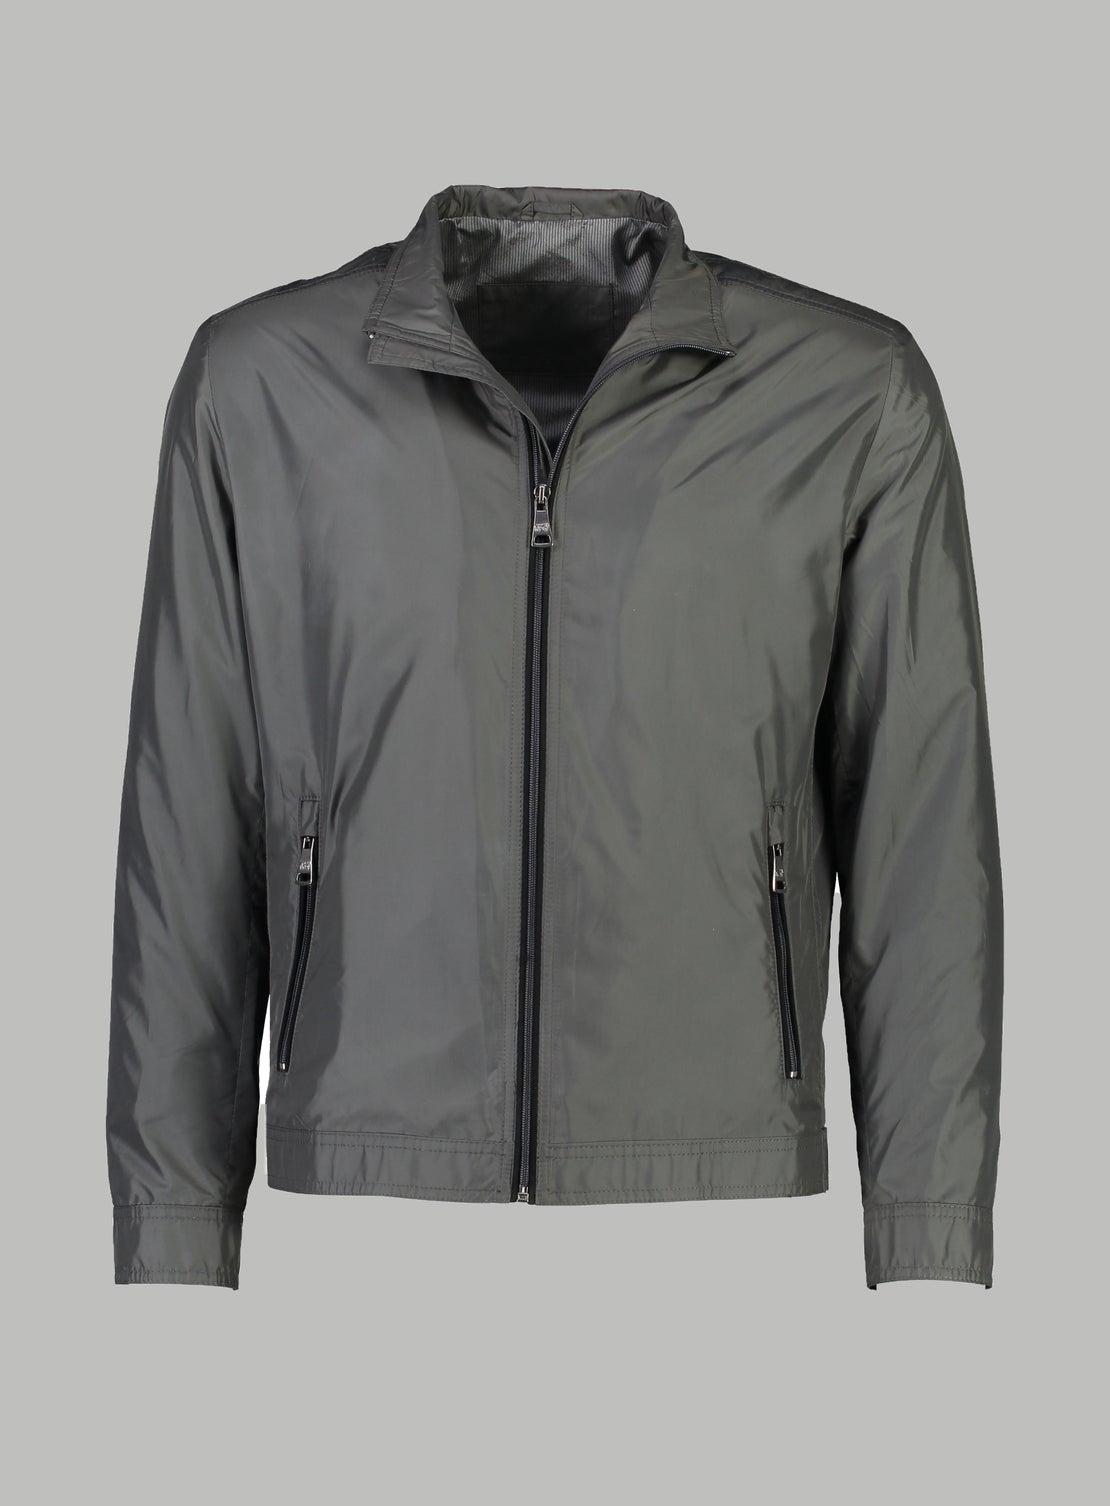 Windcheater Jacket Grey